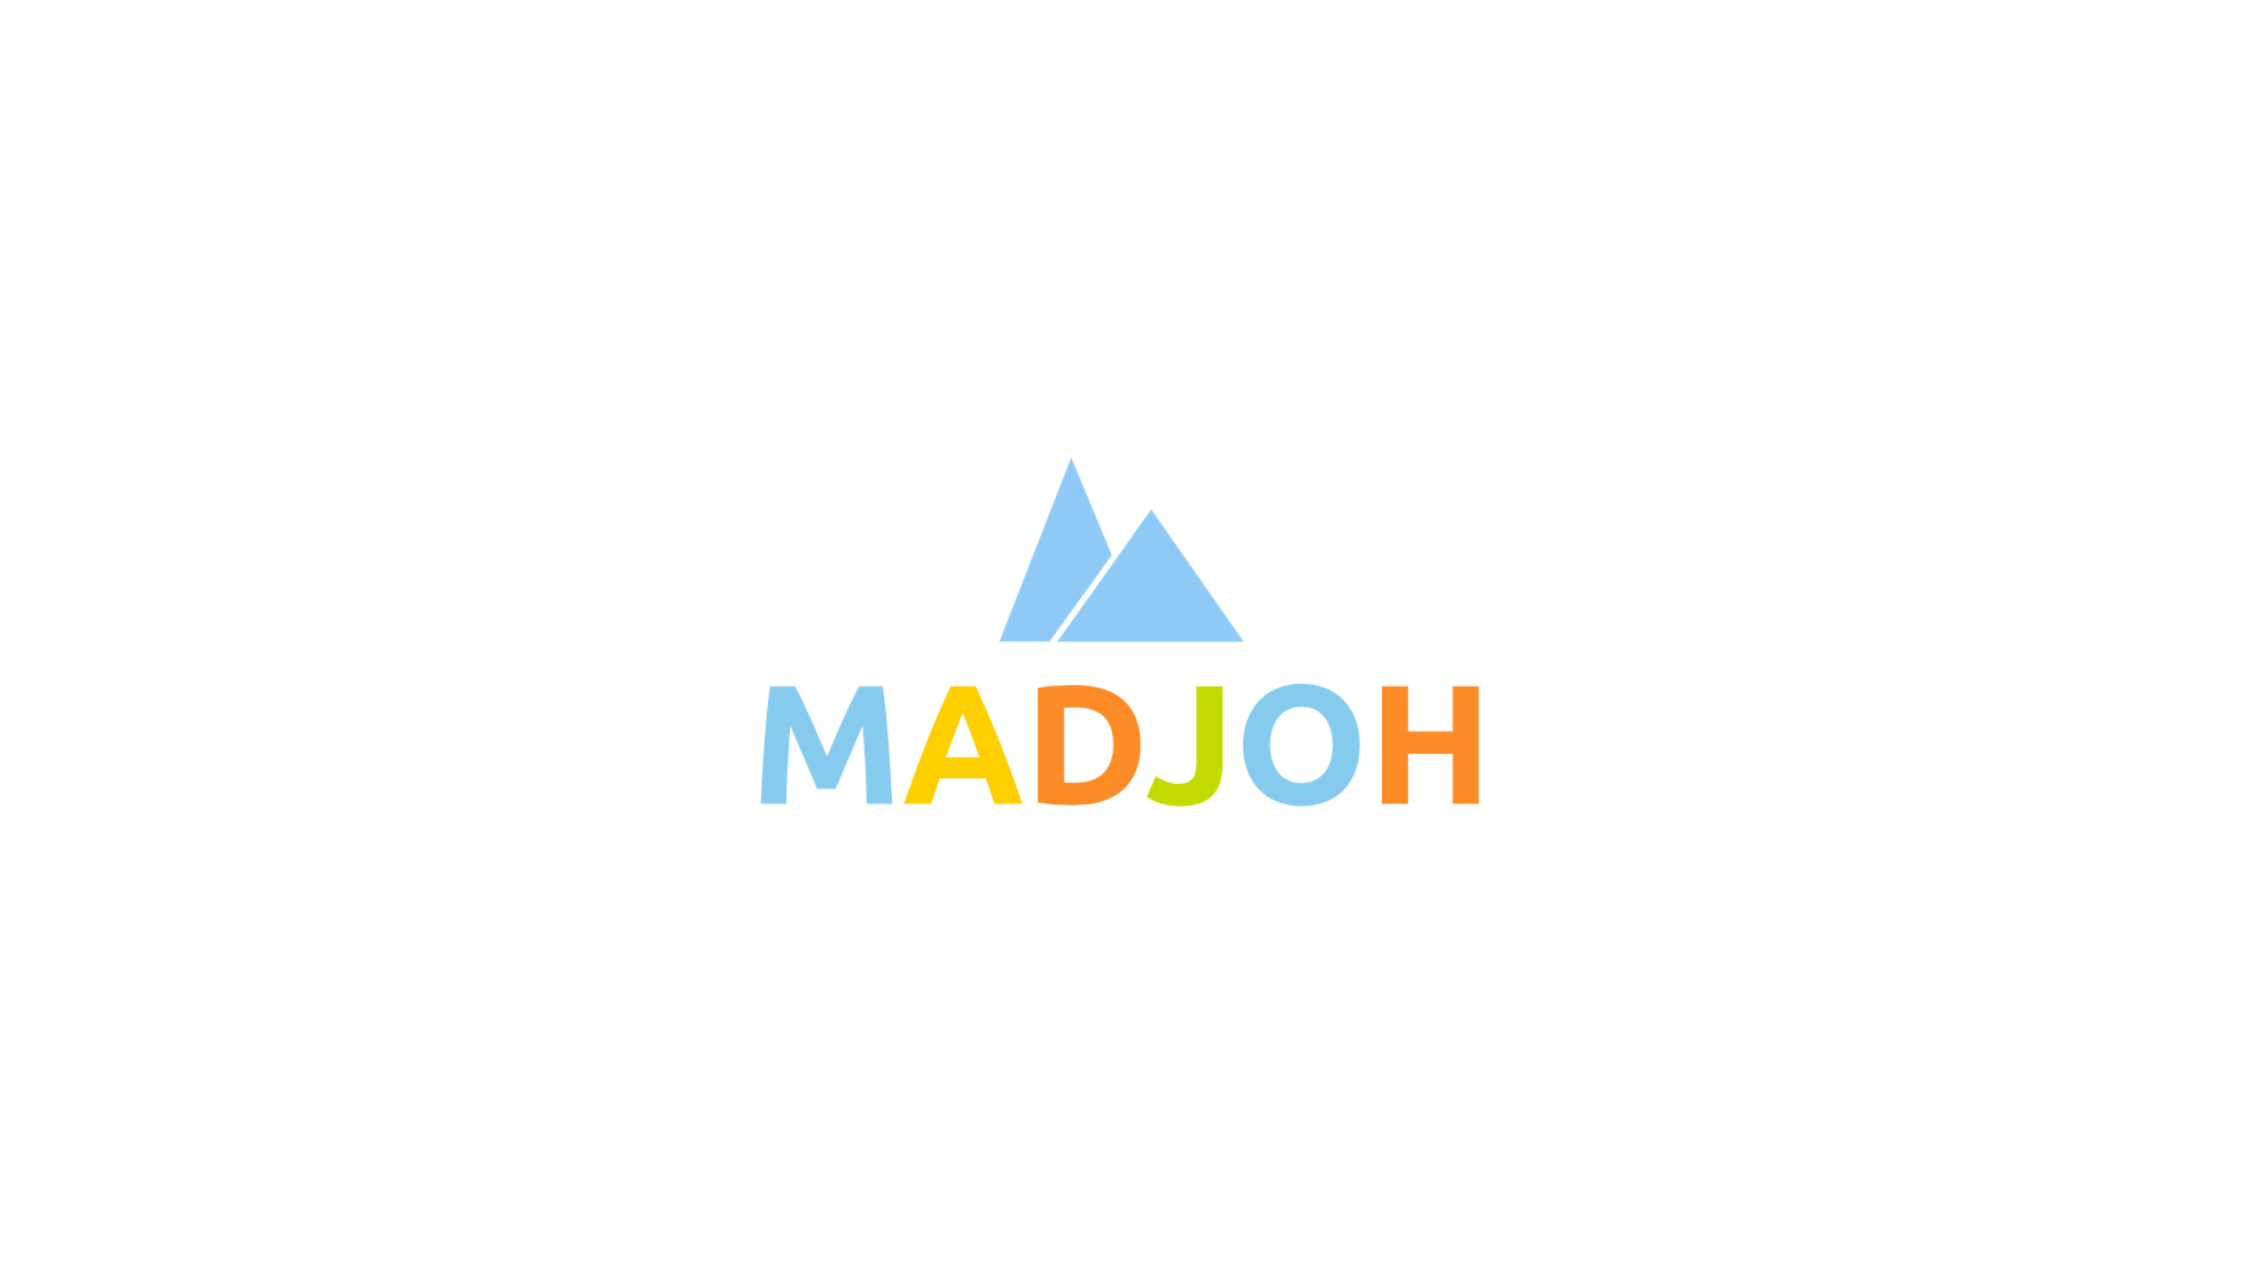 MadJoh